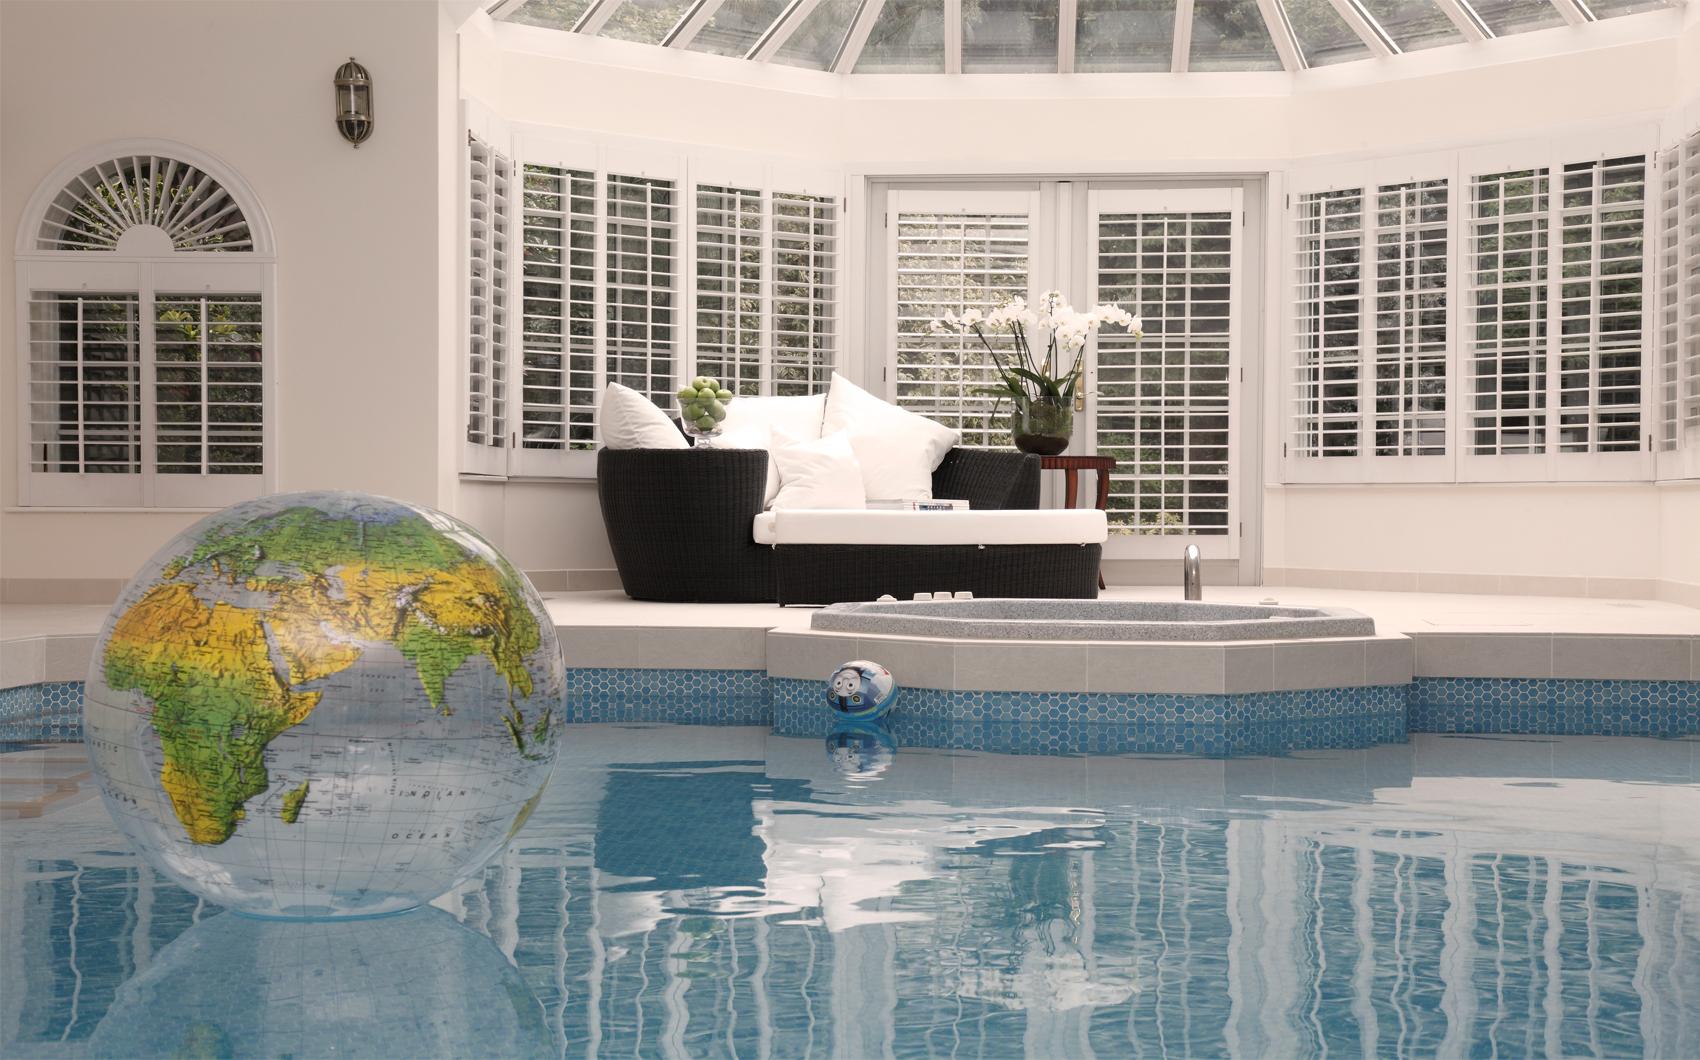 luxurious indoor swimming pool designed by top london interior designer rene dekker